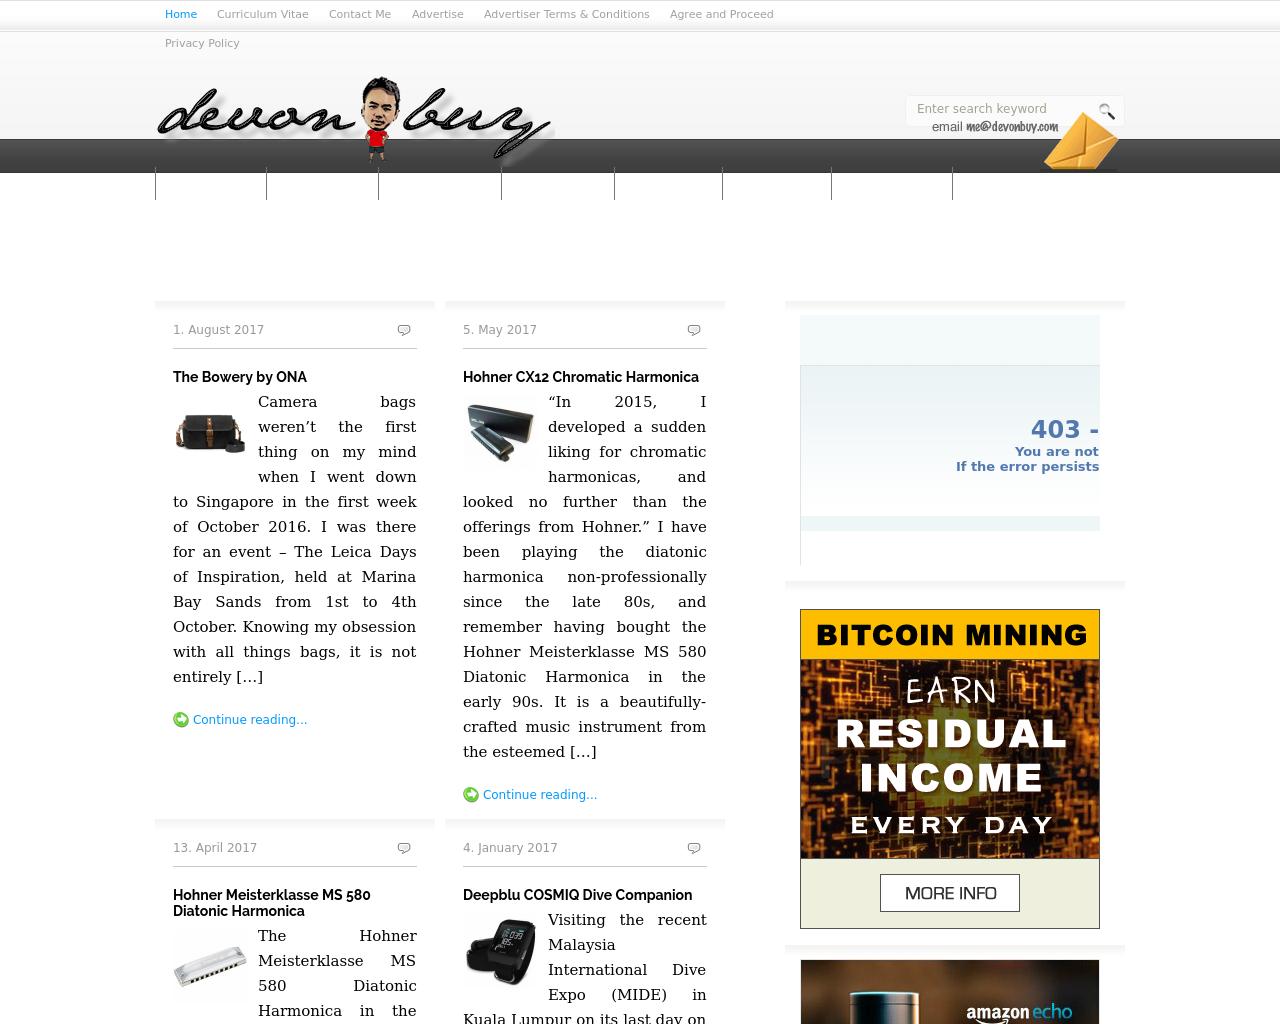 Devon-Buy-Advertising-Reviews-Pricing